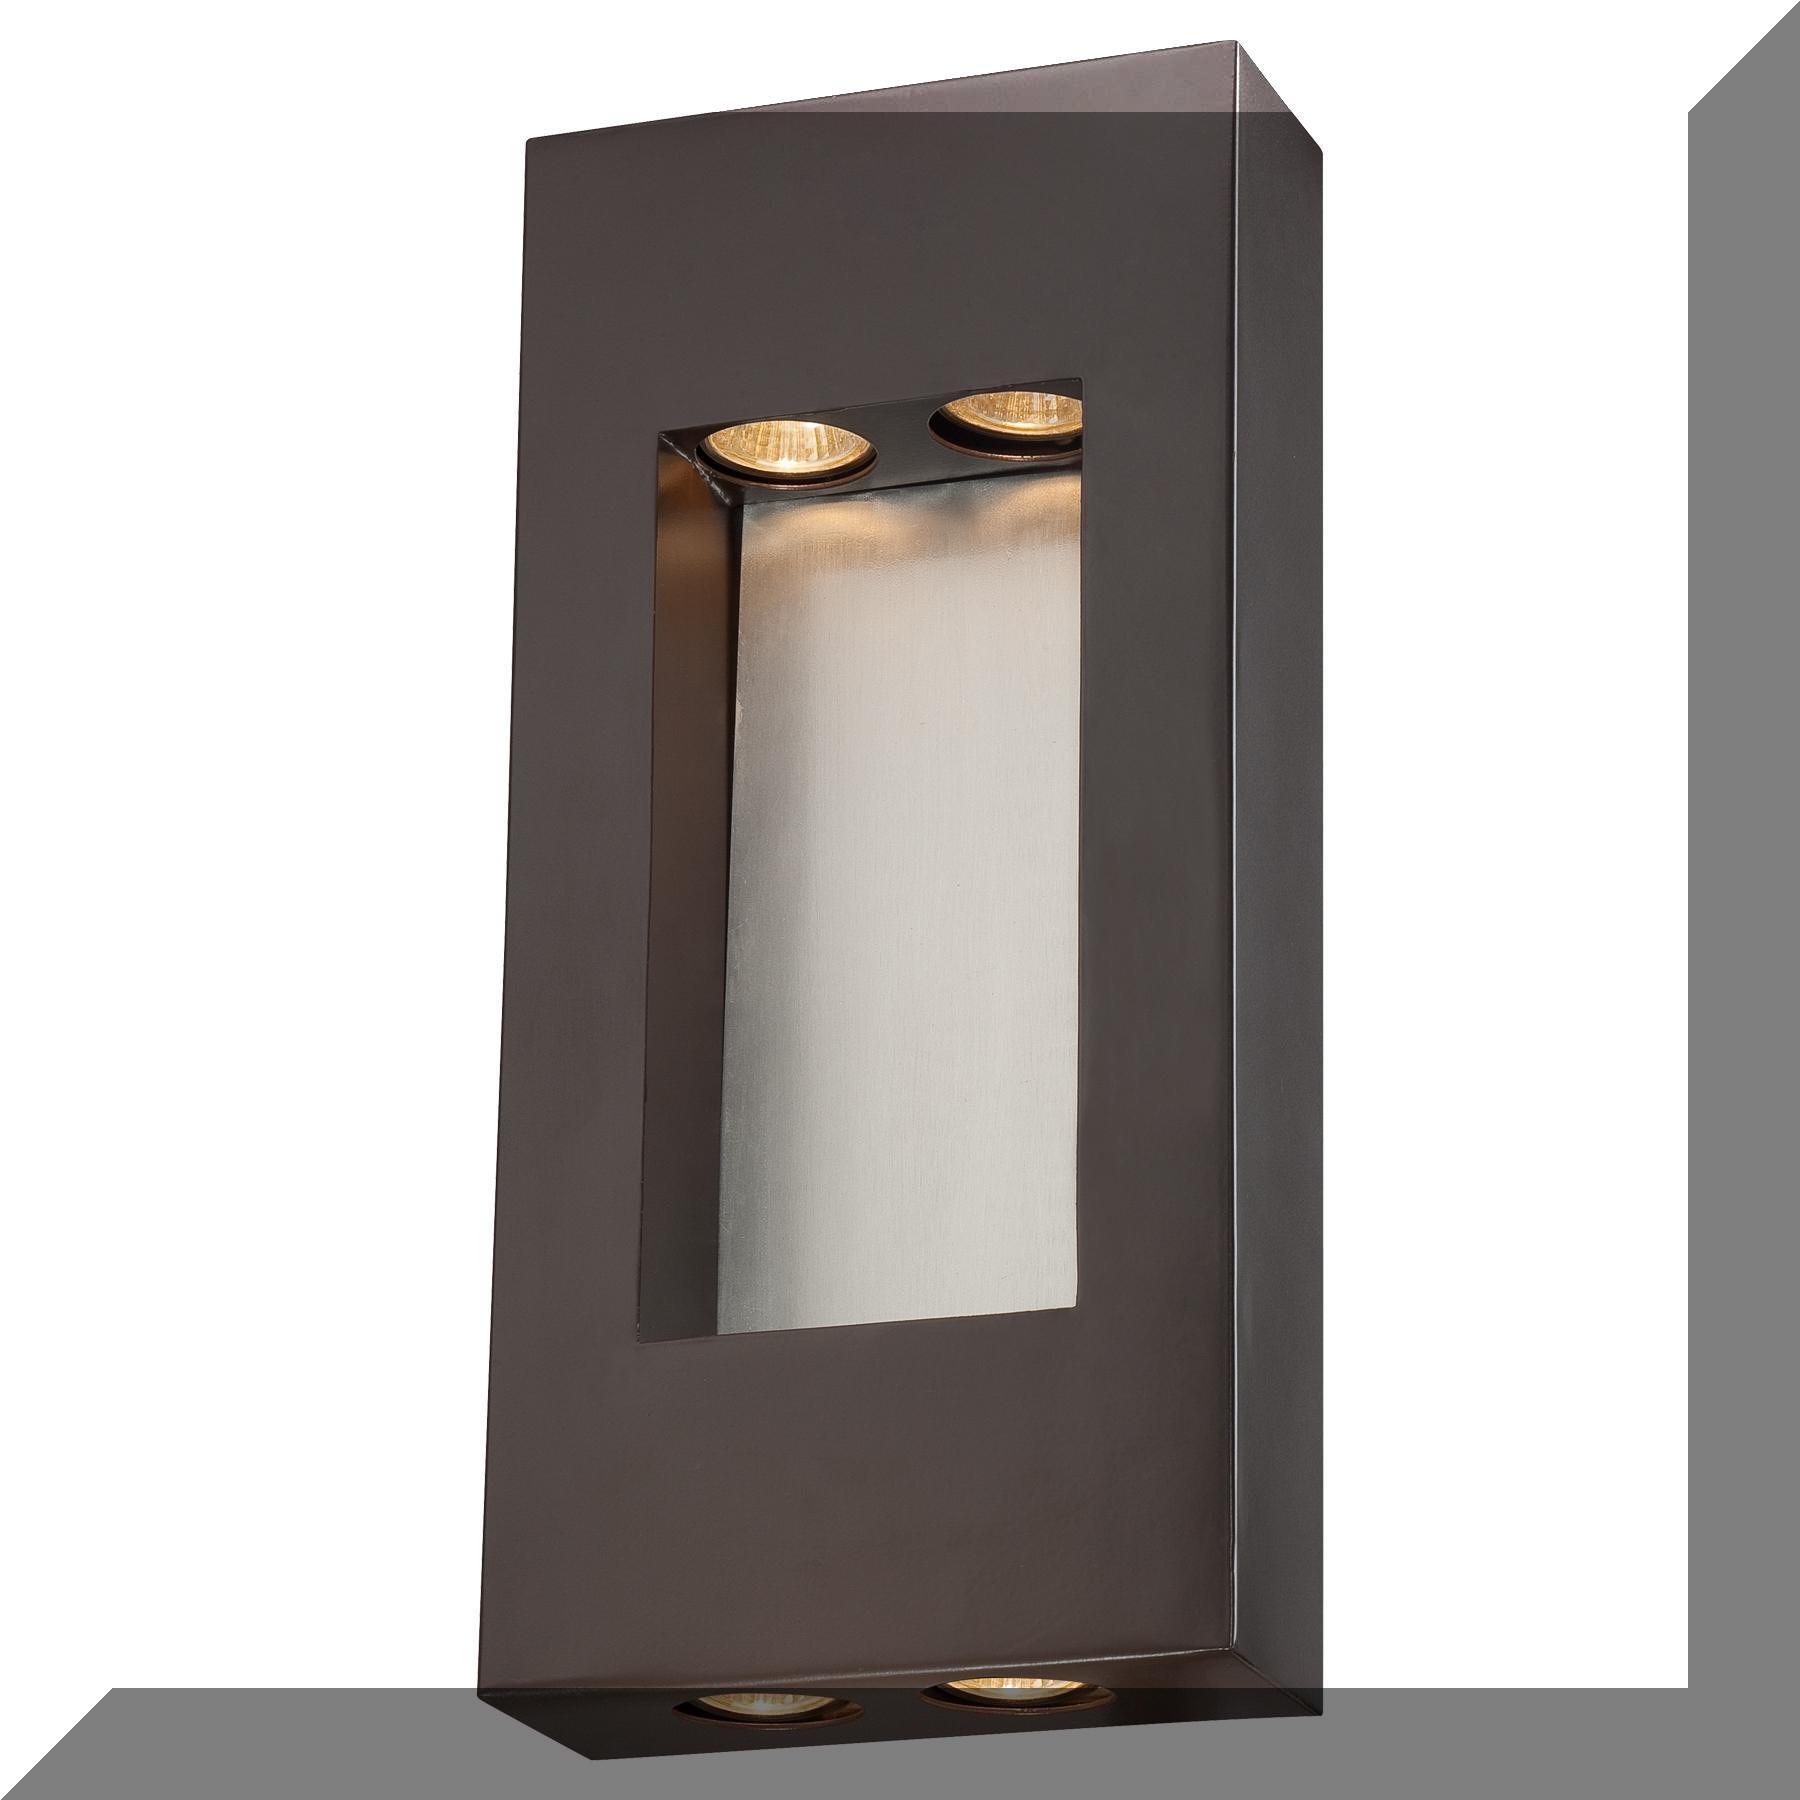 And Oriental Outdoor Lighting Fixtures With Regard To Japanese Outdoor Wall Lighting (#4 of 15)